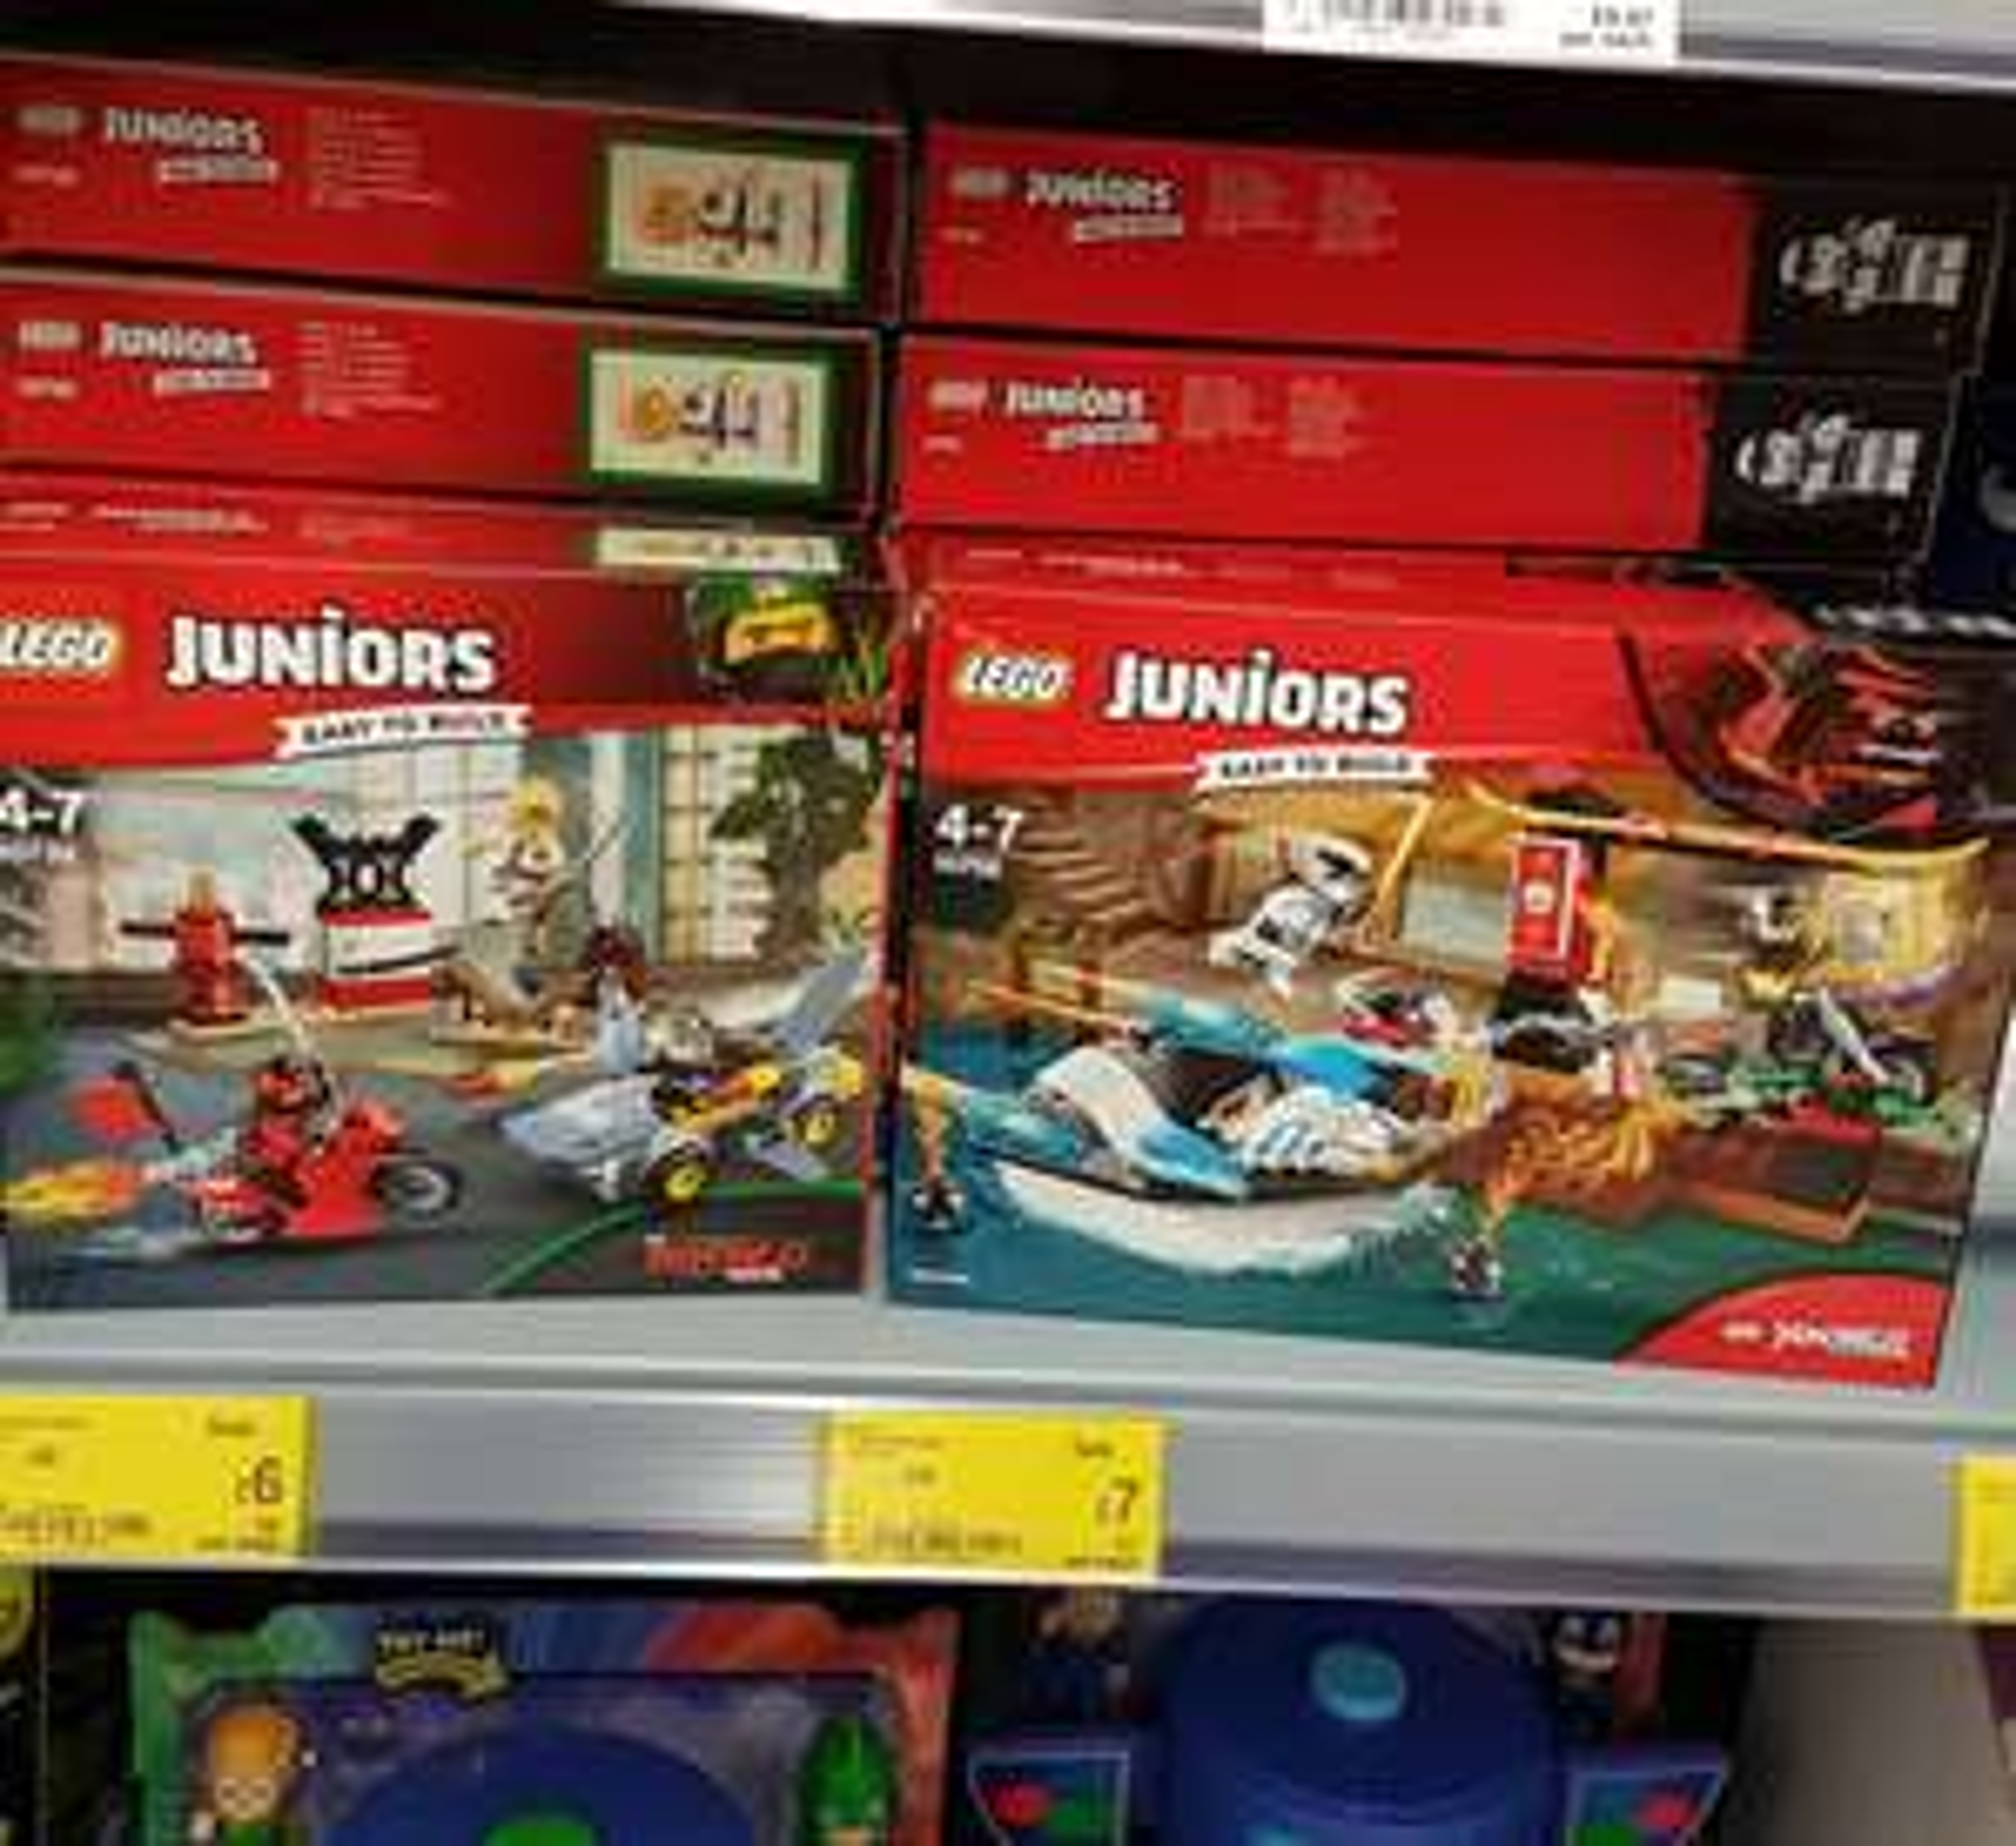 Lego Juniors Ninjago sets half price at Asda -  Burnley e.g 10739 Ninjago - was £12, now £6.